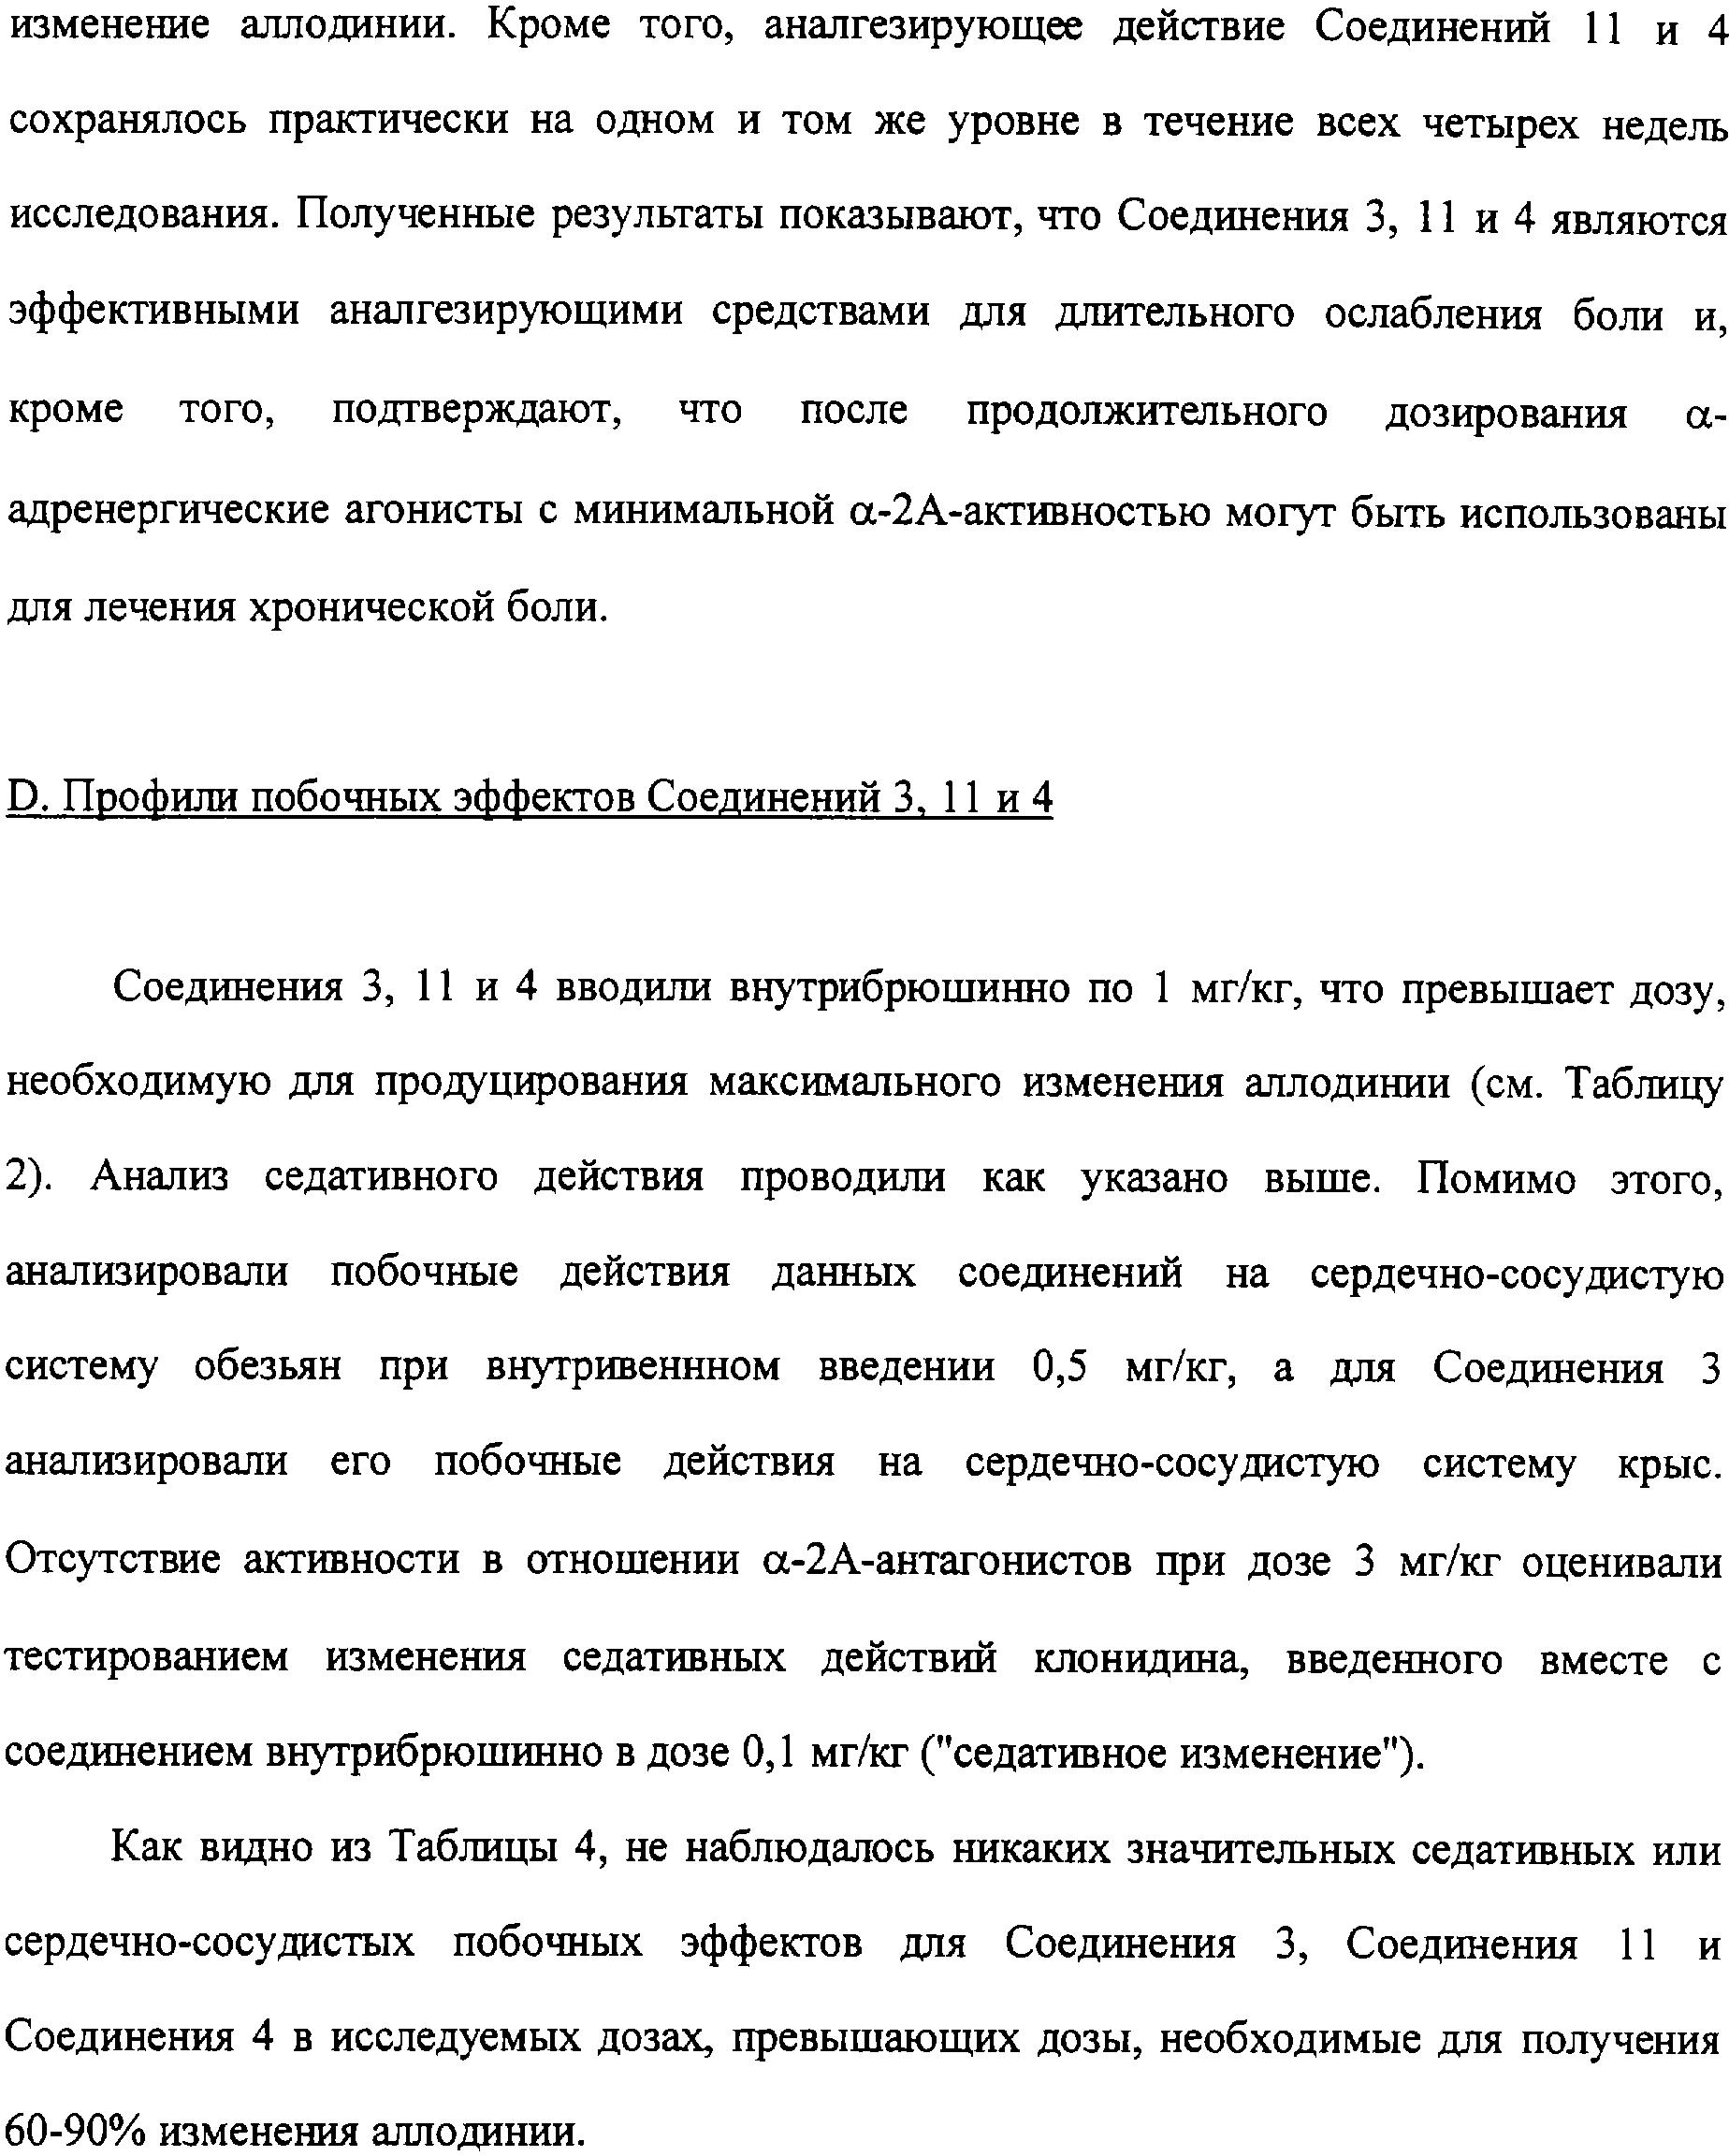 Figure 00000088